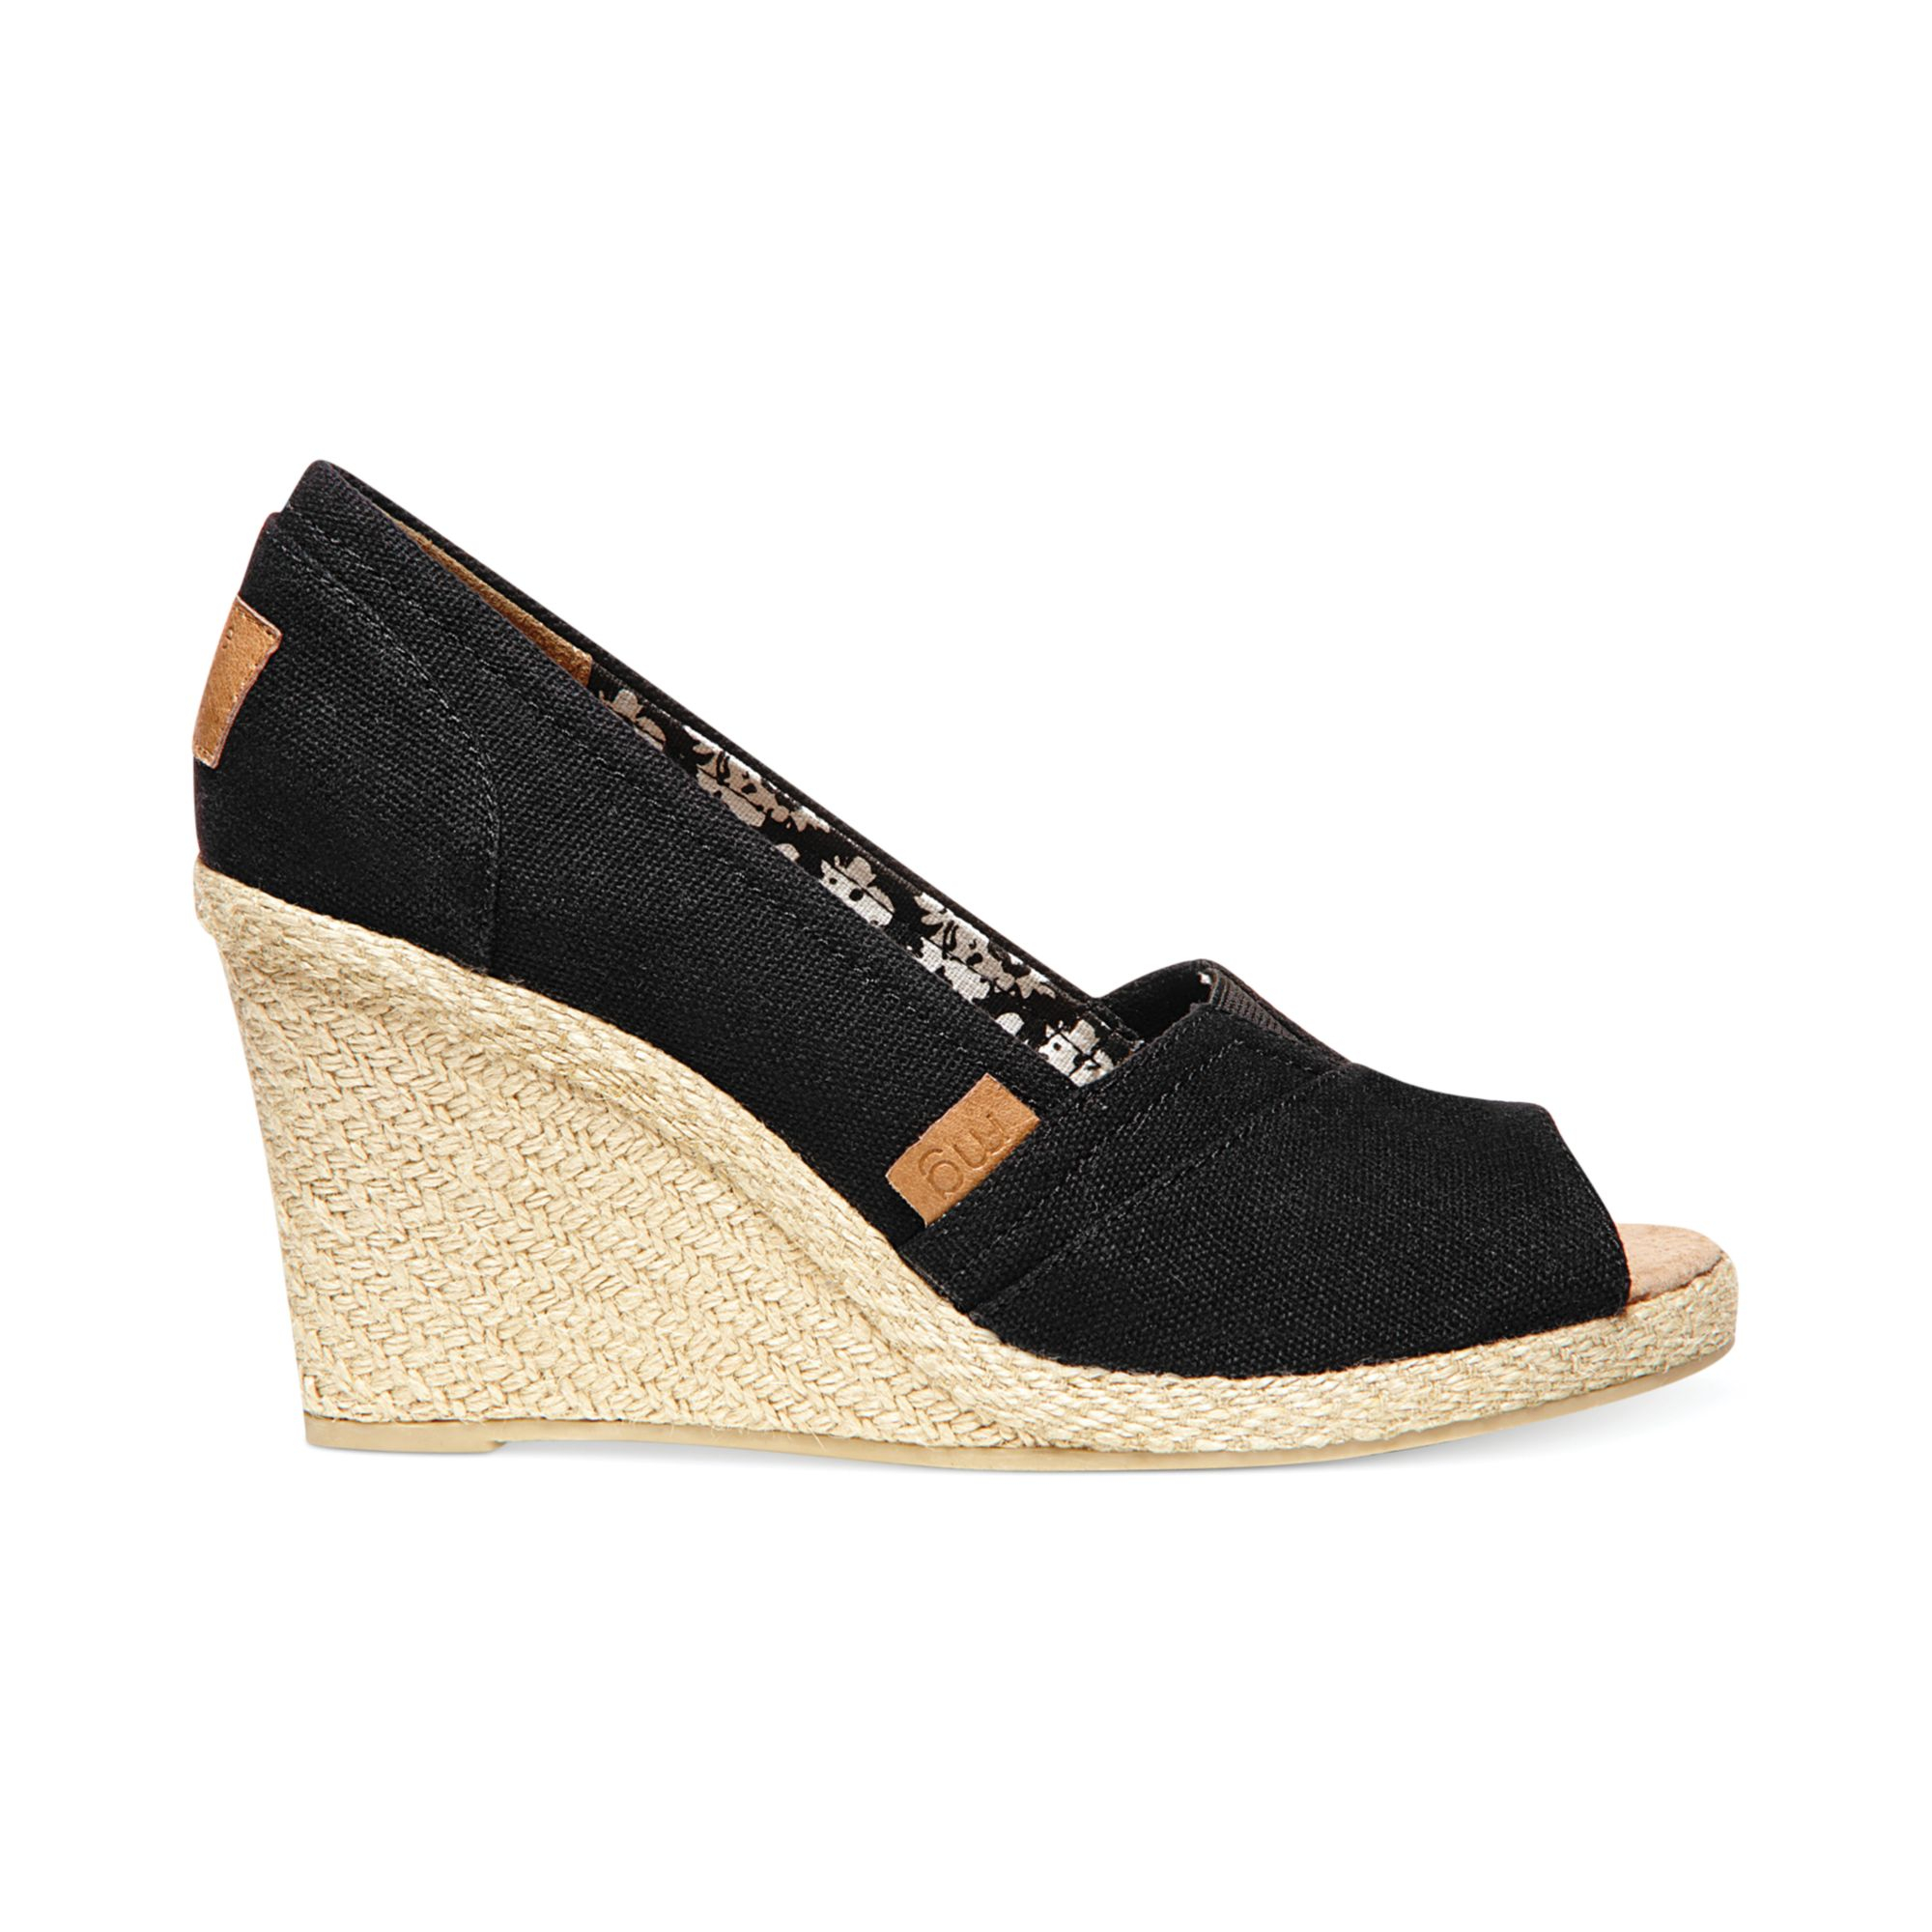 madden tackle espadrille wedge sandals in black